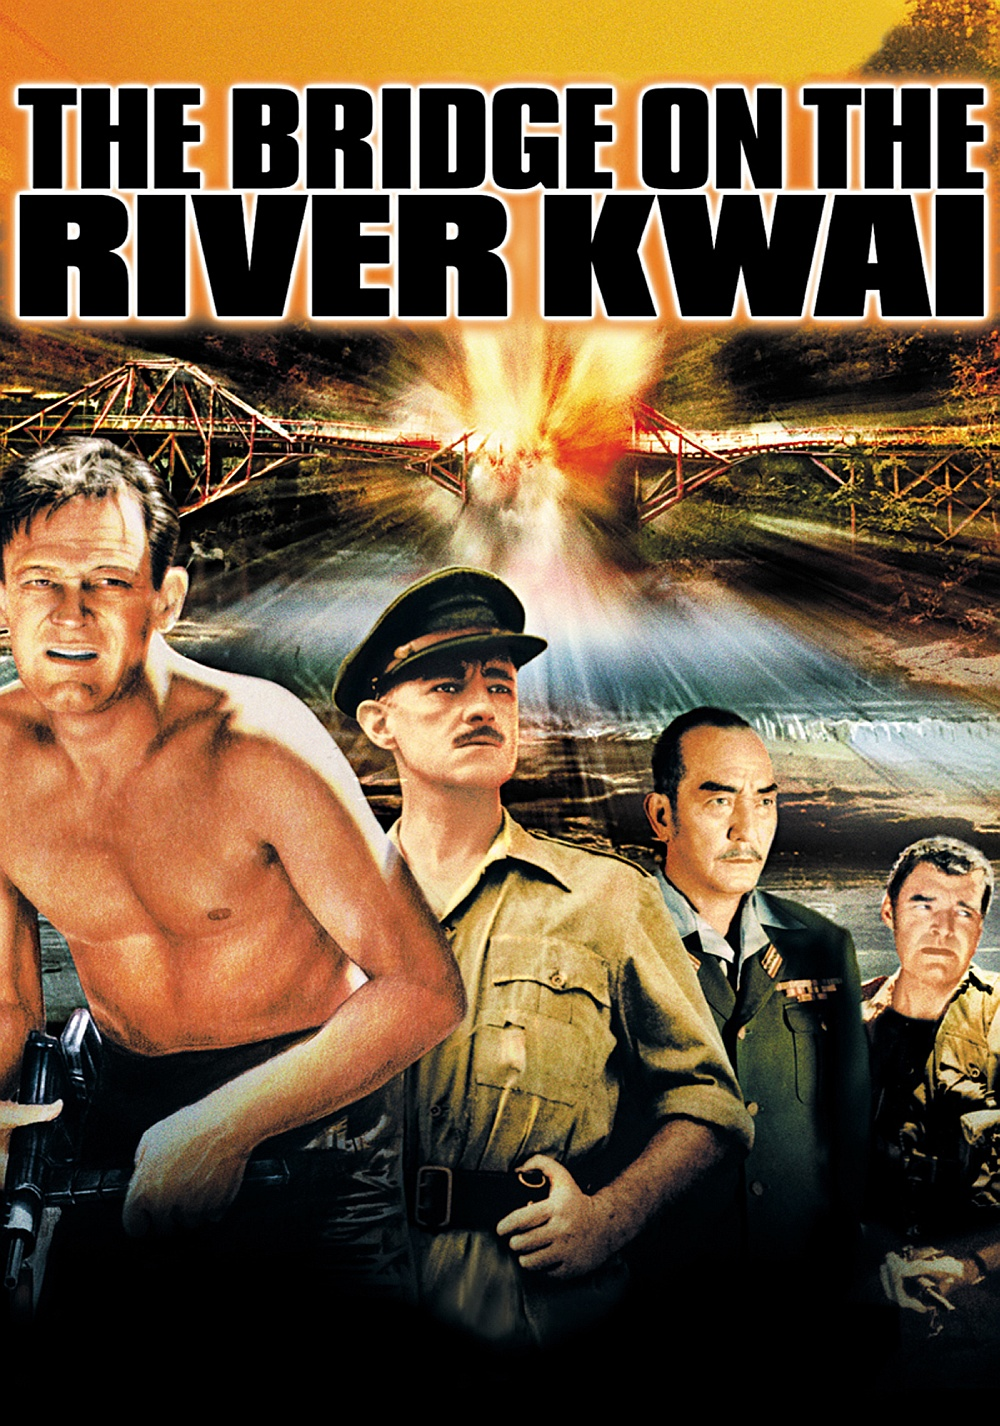 The Bridge on the River Kwai  Movie fanart  fanart.tv